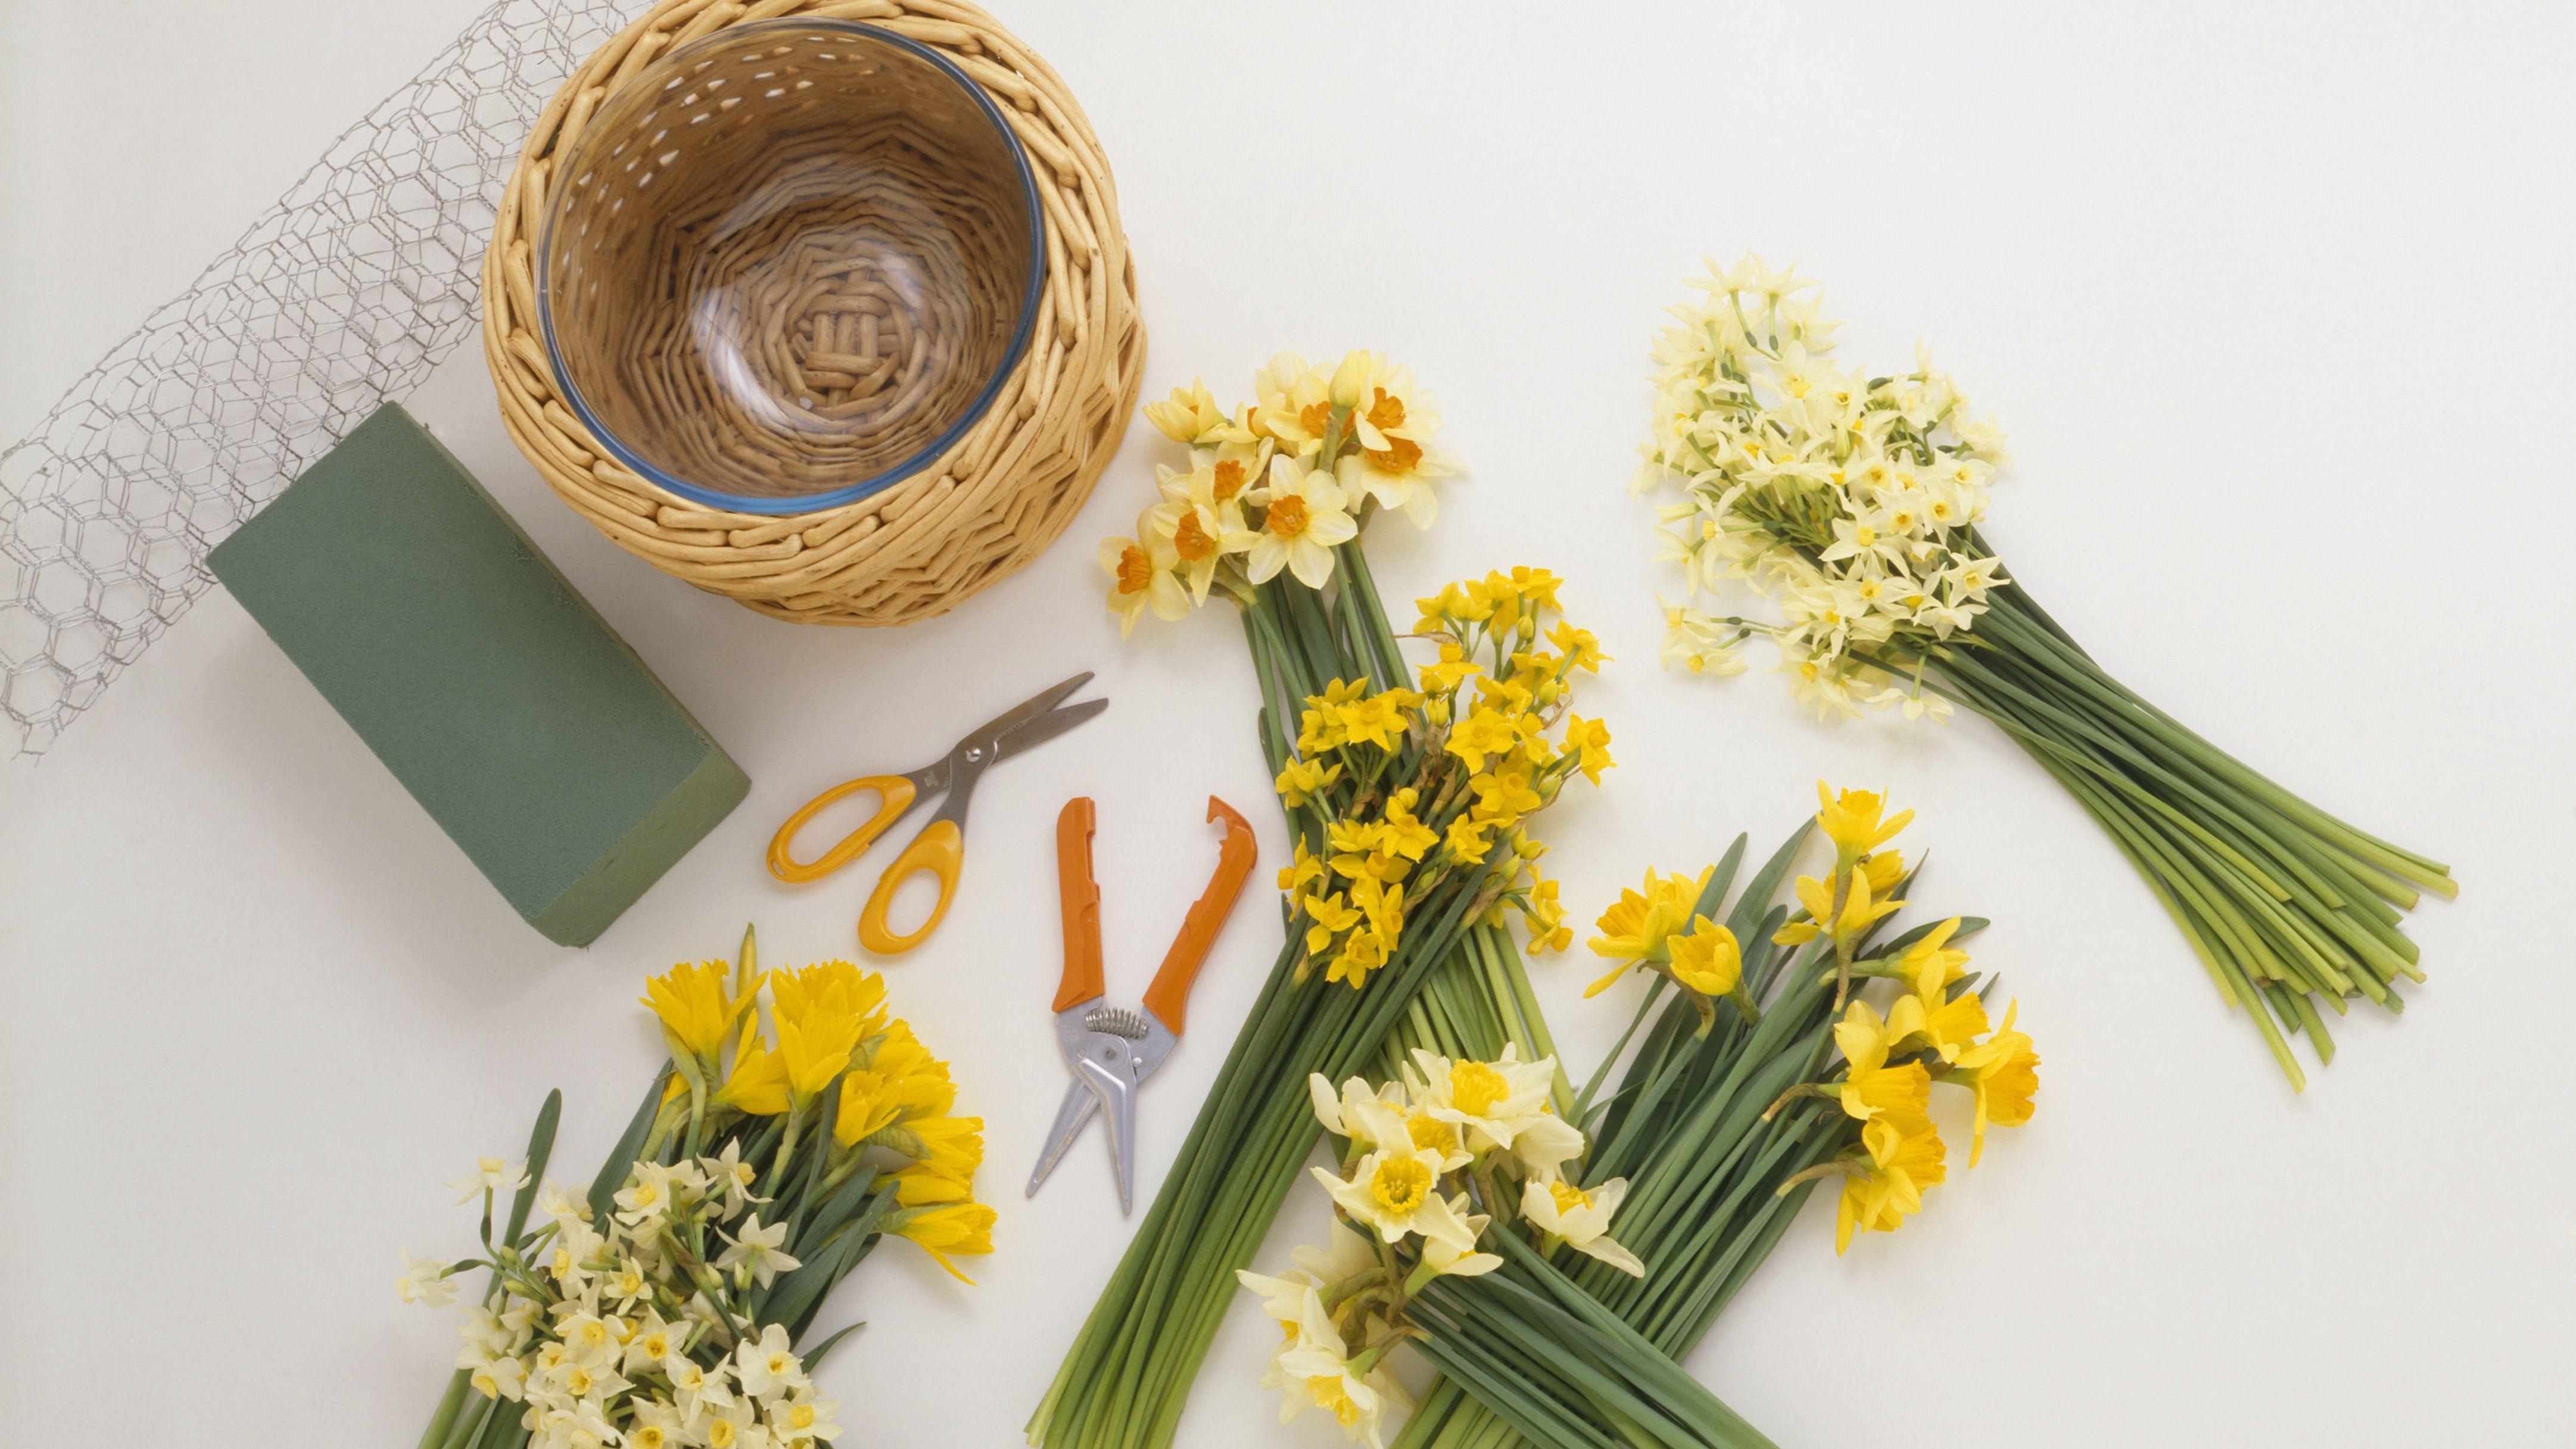 Basic Flower Arranging Supplies